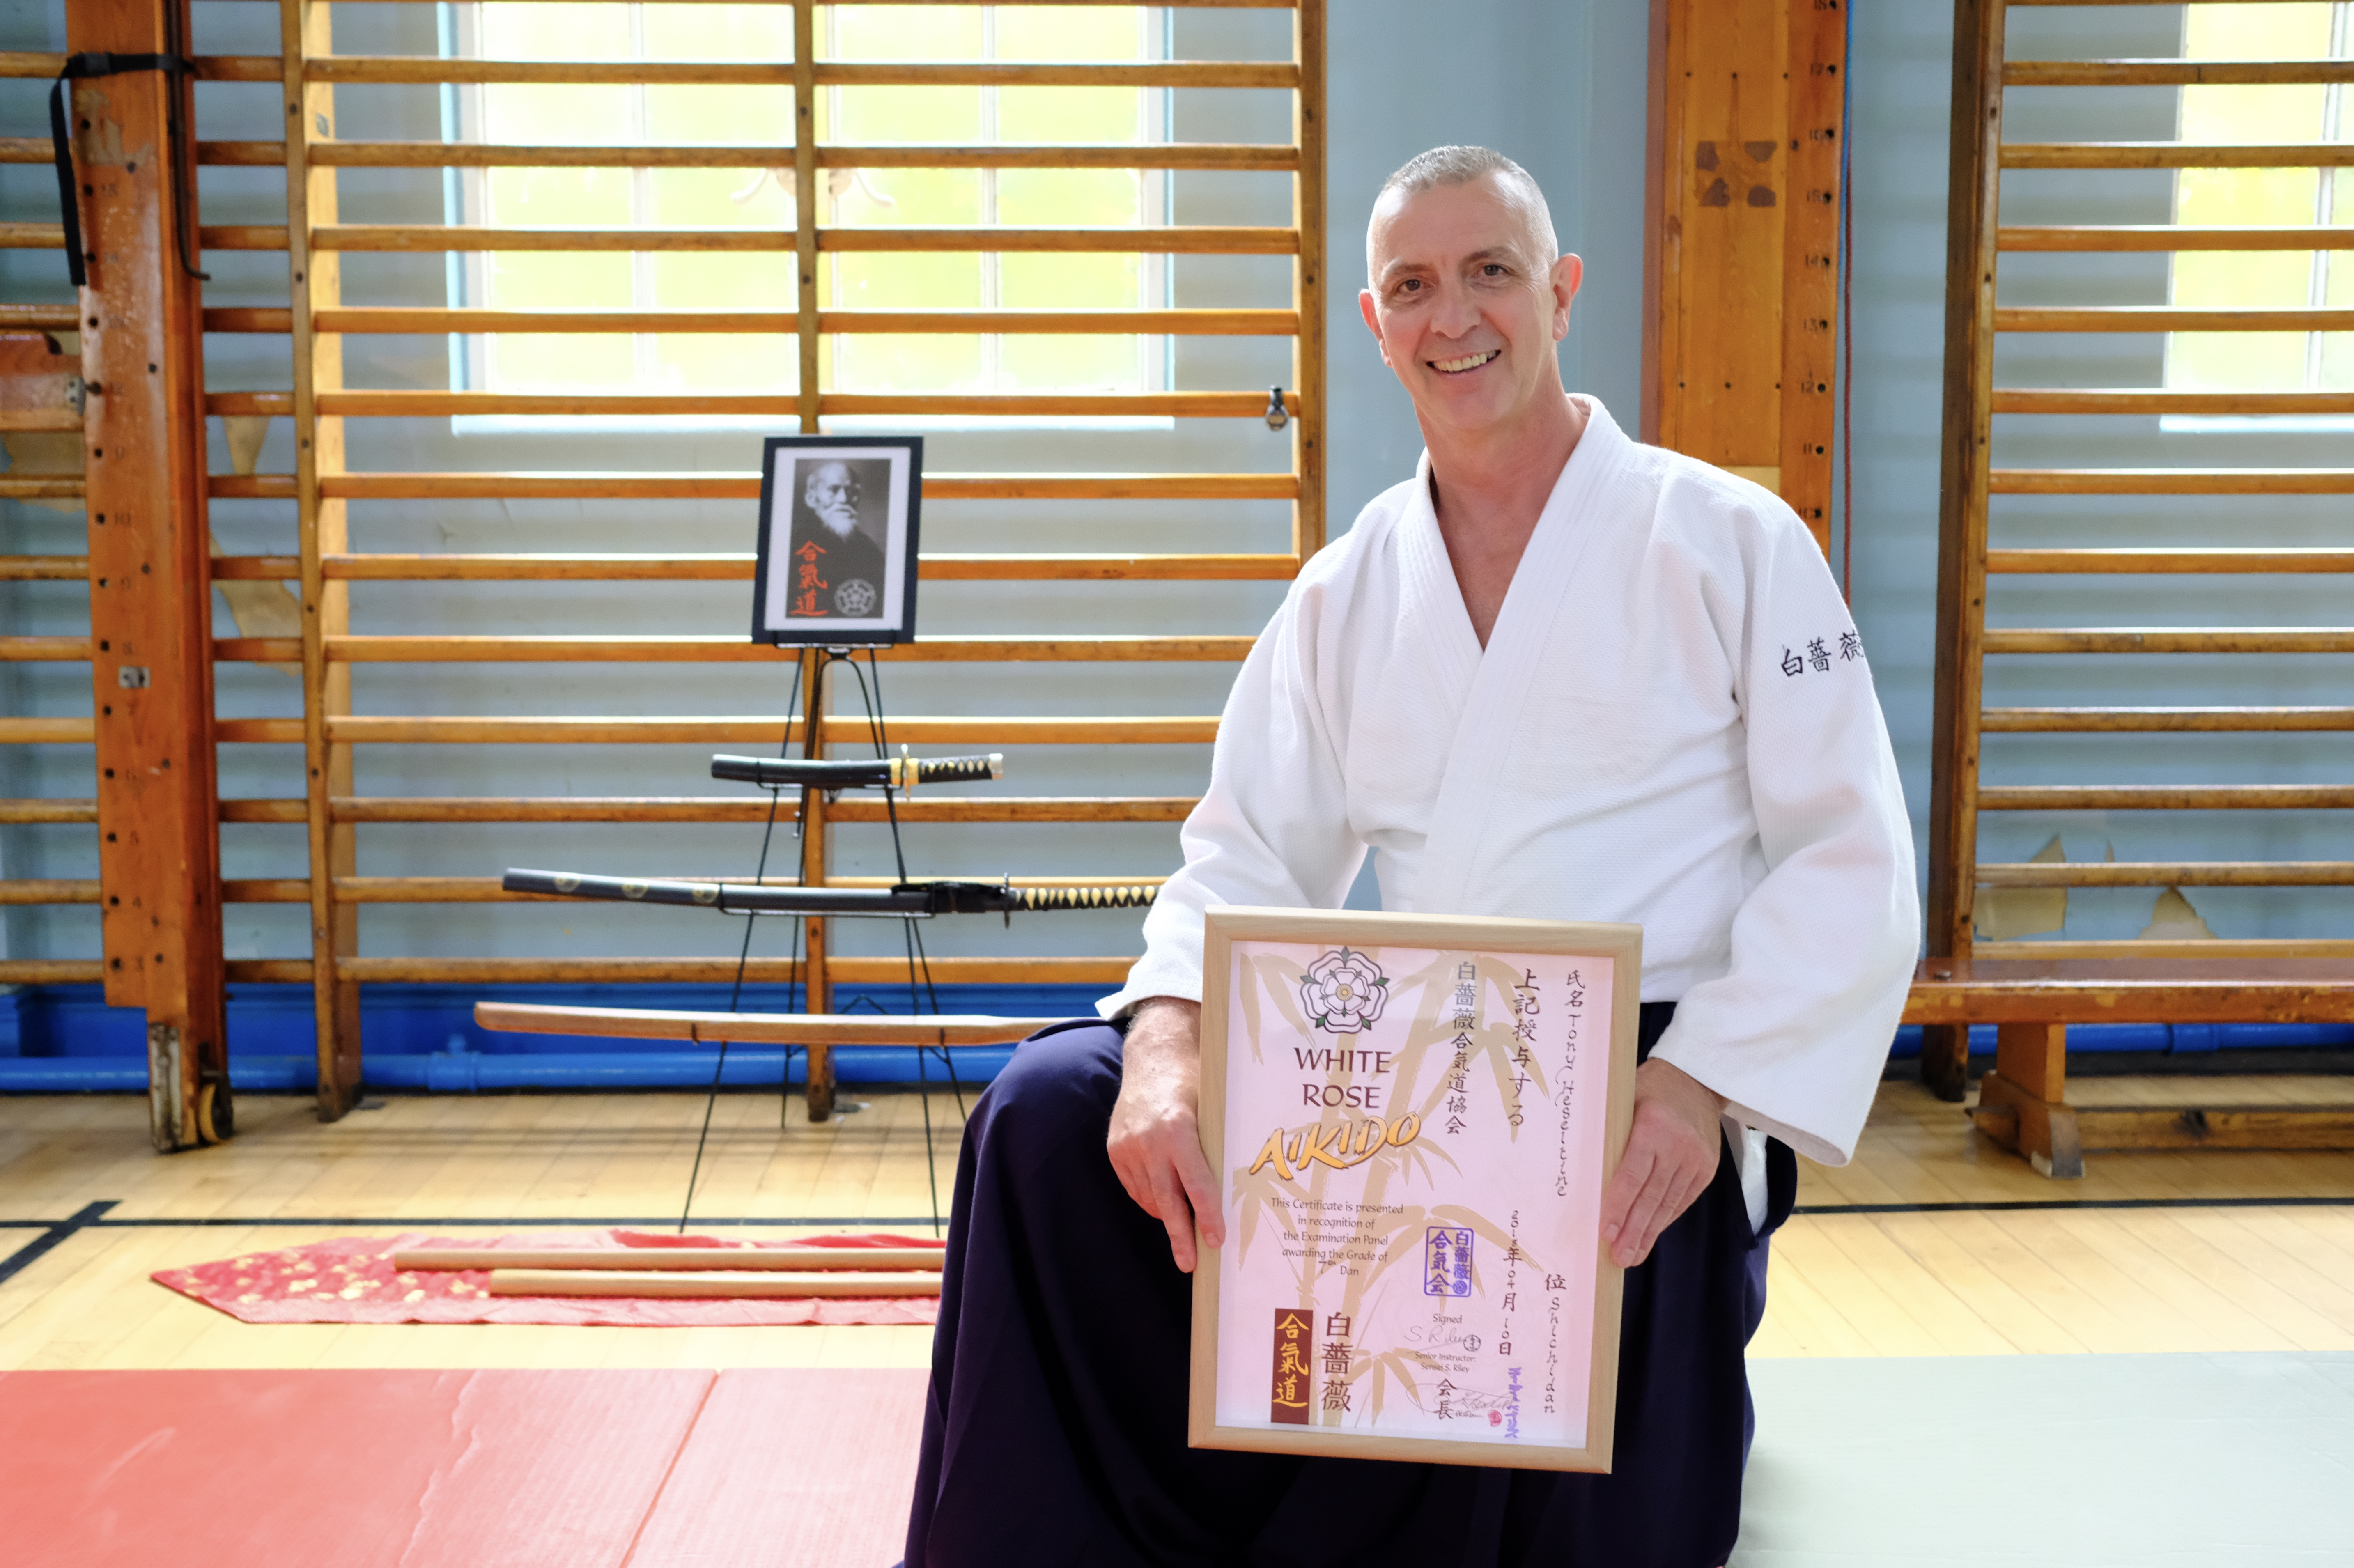 Sensei Heseltine with his 7th Dan certificate